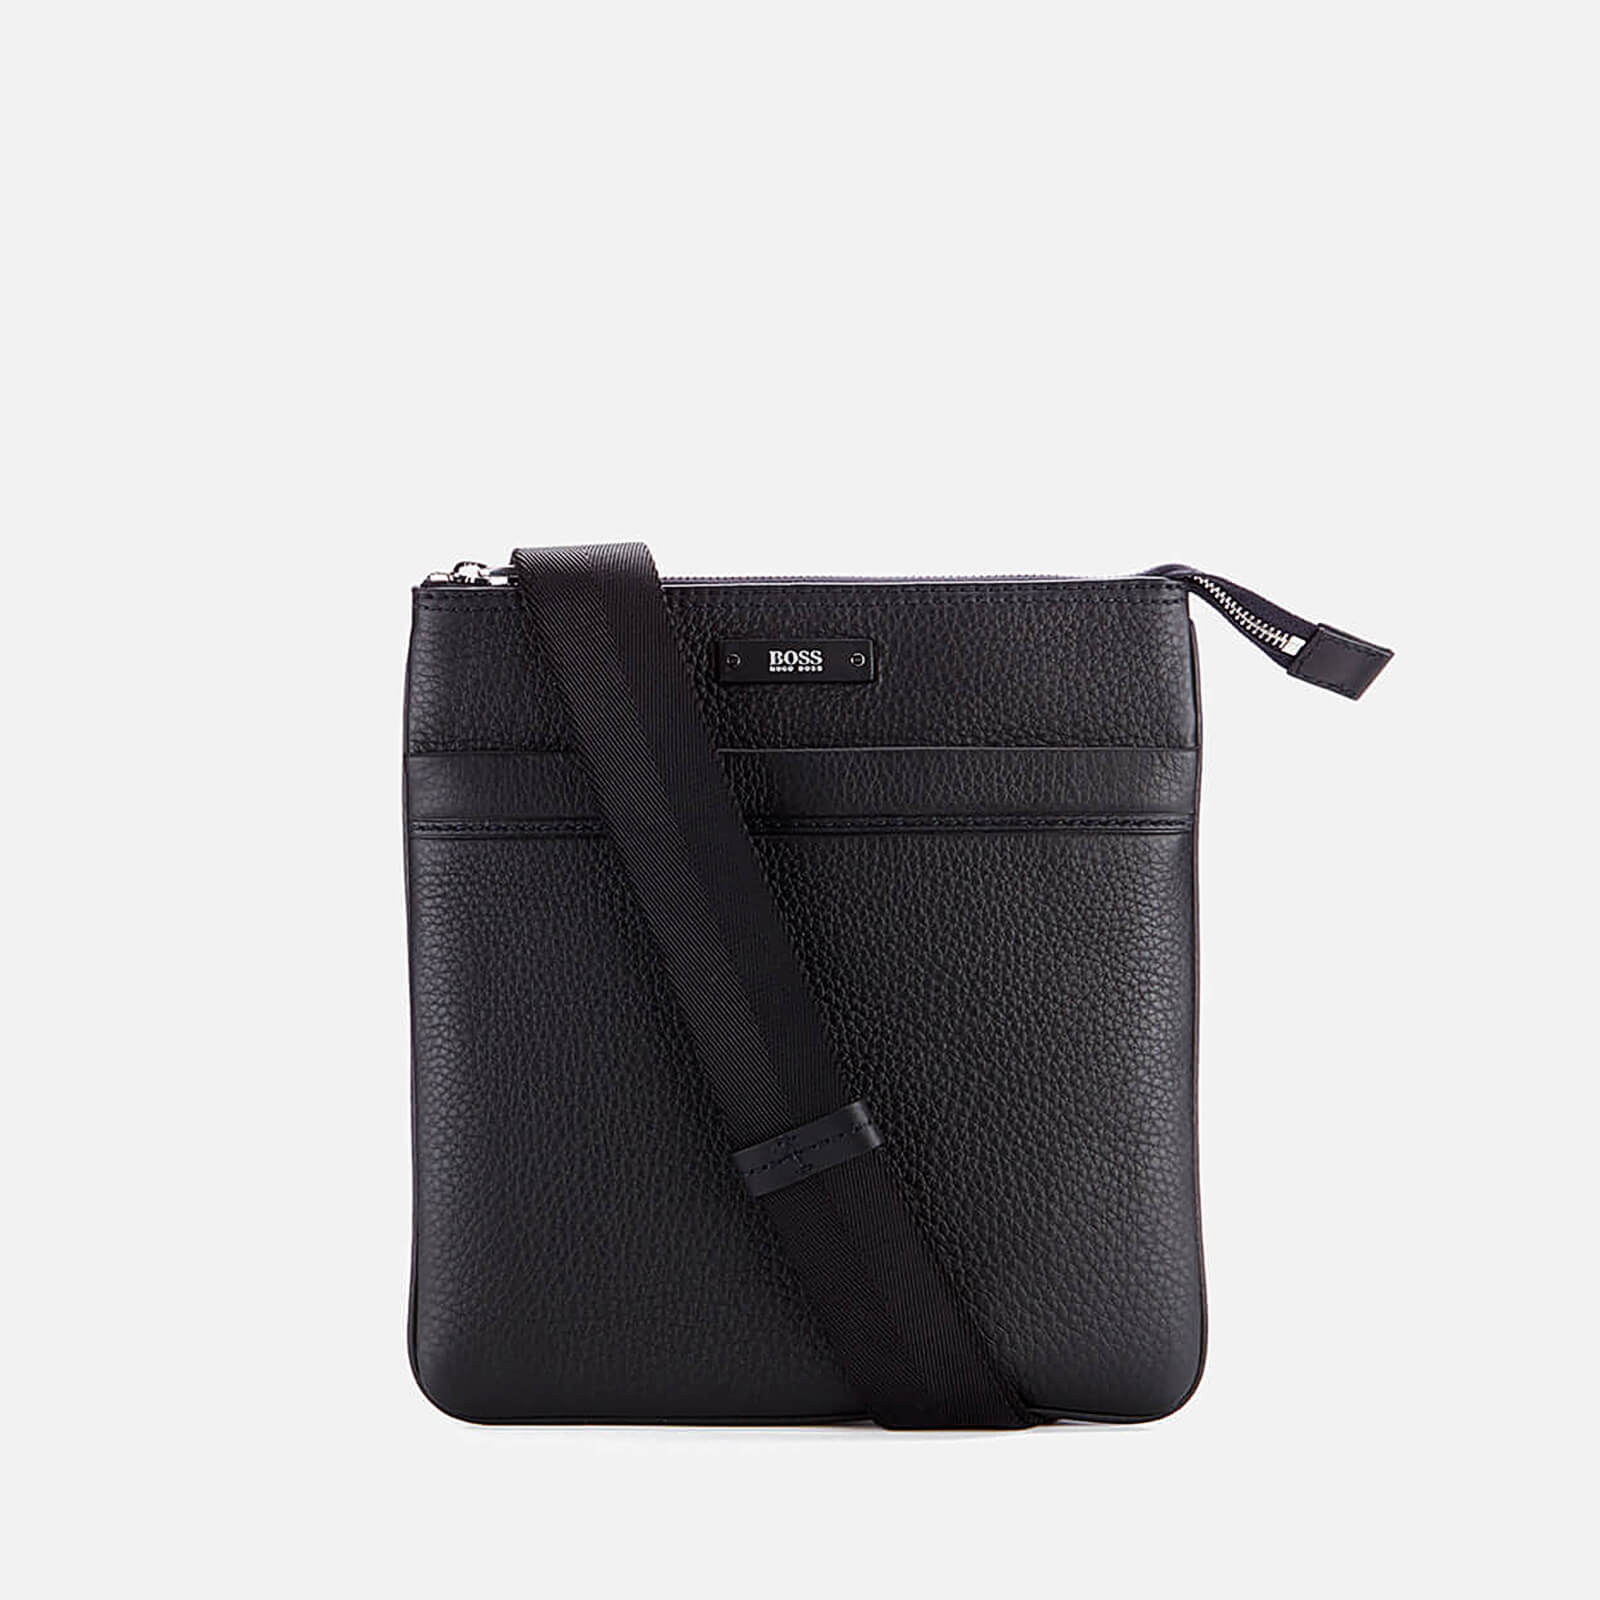 074ca8d6218 BOSS Traveller Zip Cross Body Bag - Black Mens Accessories